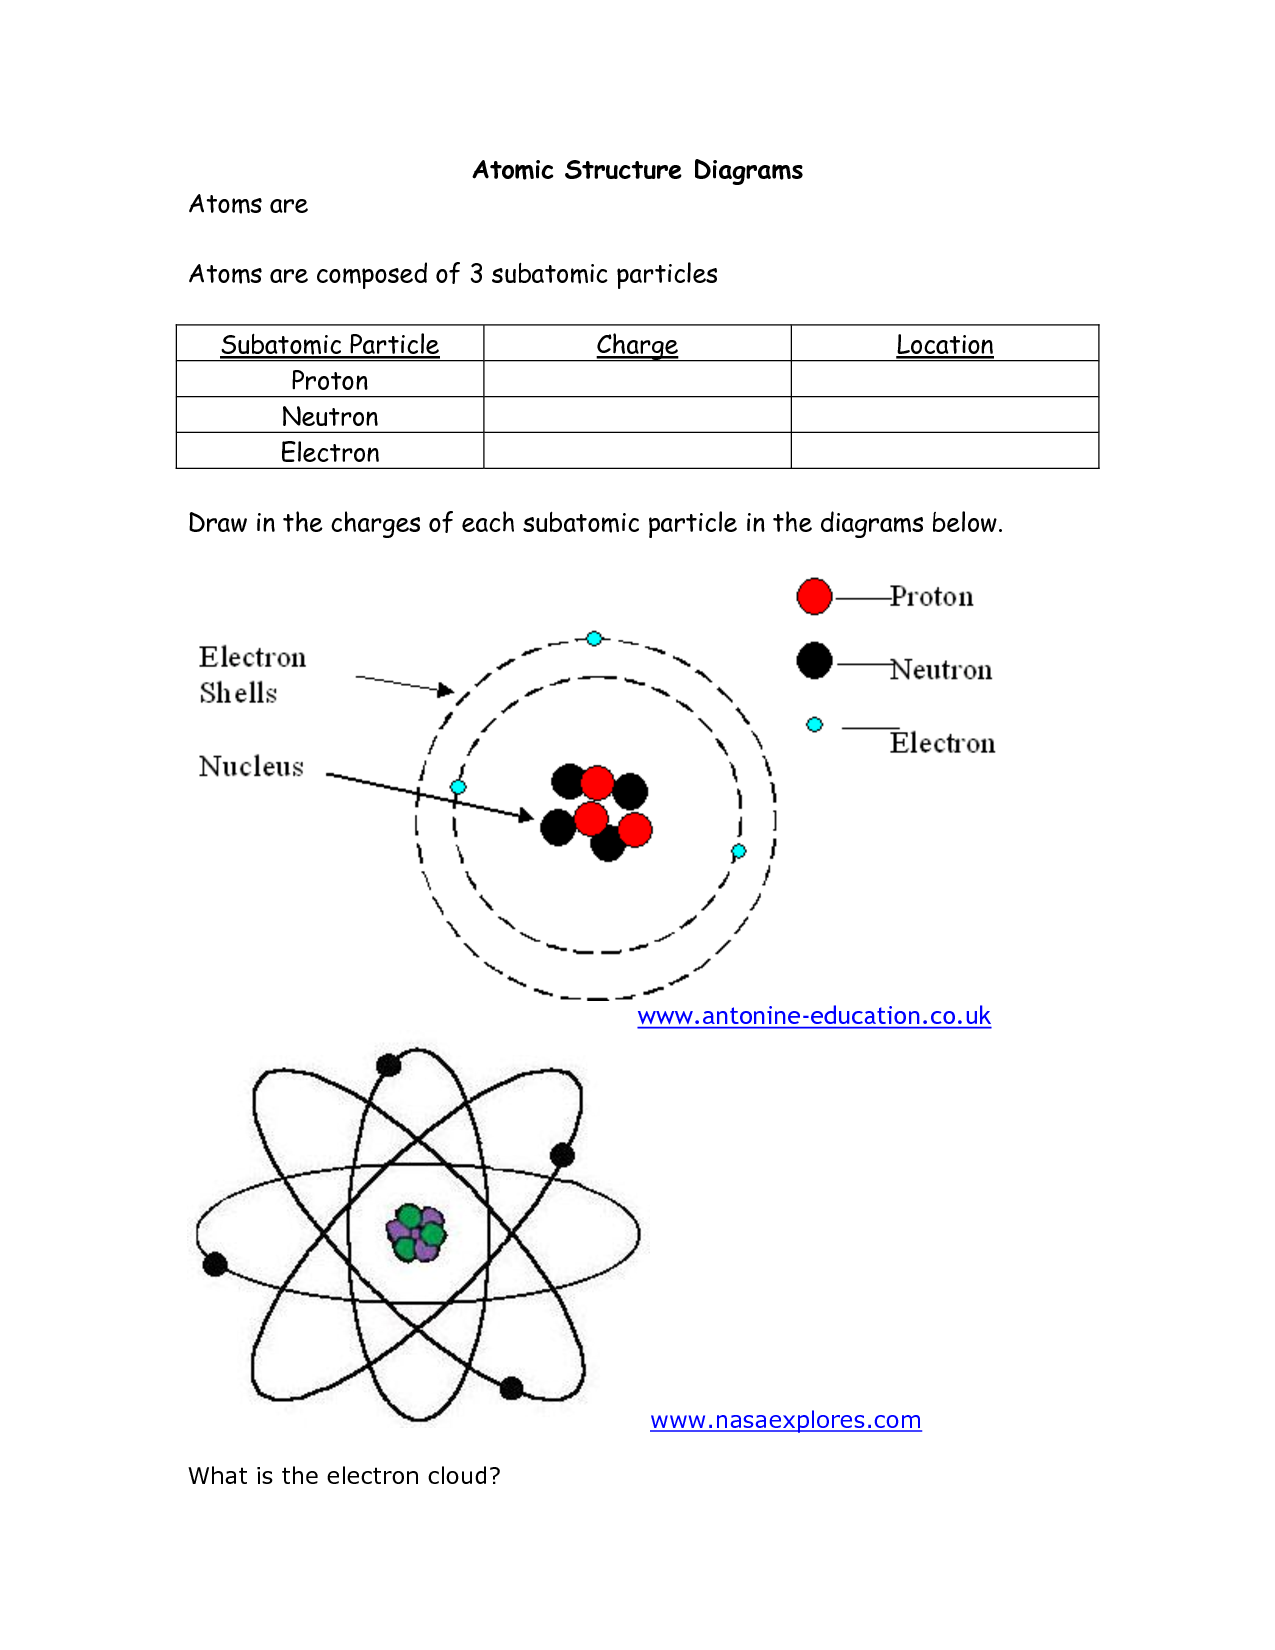 Worksheets Parts Of The Atom Worksheet atomic structure diagram worksheet diagrams sample 7 documents in word pdf